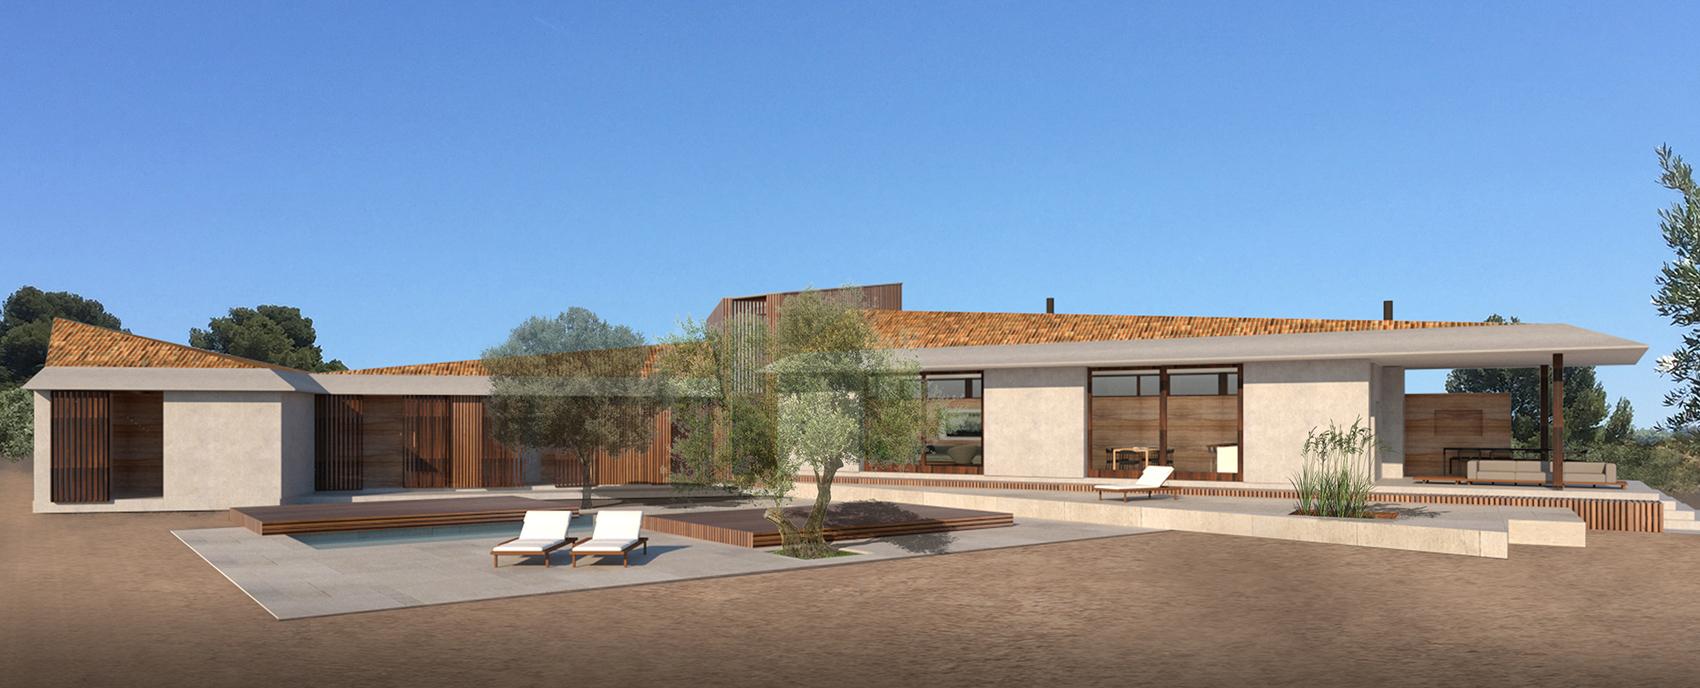 House Matarraña pool terrace with olive trees